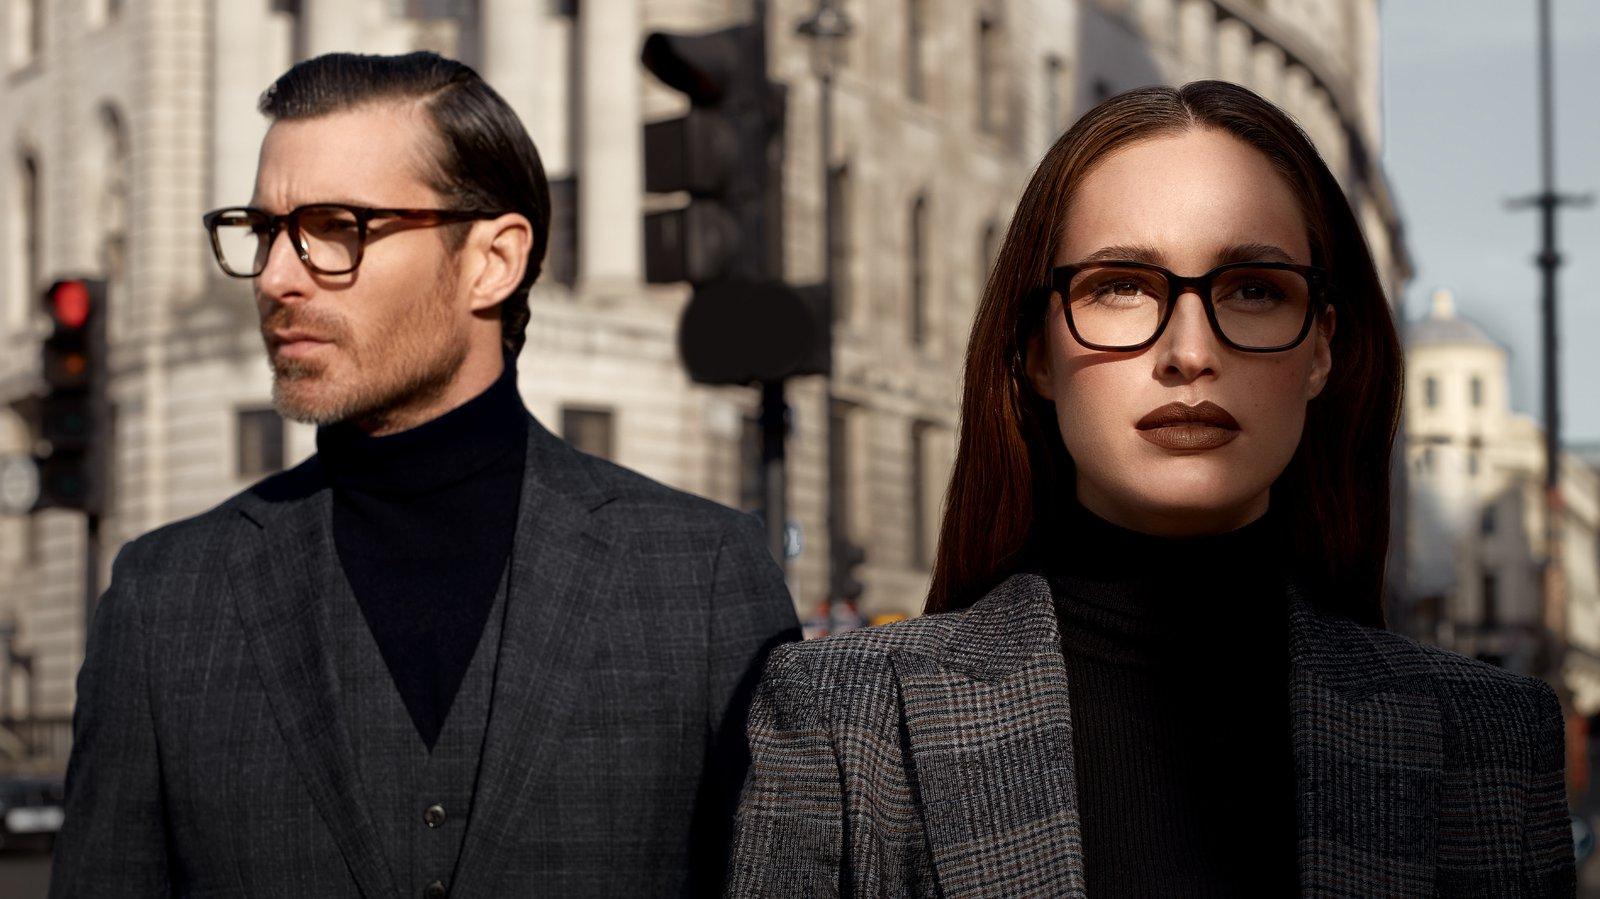 Eyeglasses by NIRVAN JAVAN from article The Best Independent Eyewear Brands published by FAVR the premium eyewear finder.